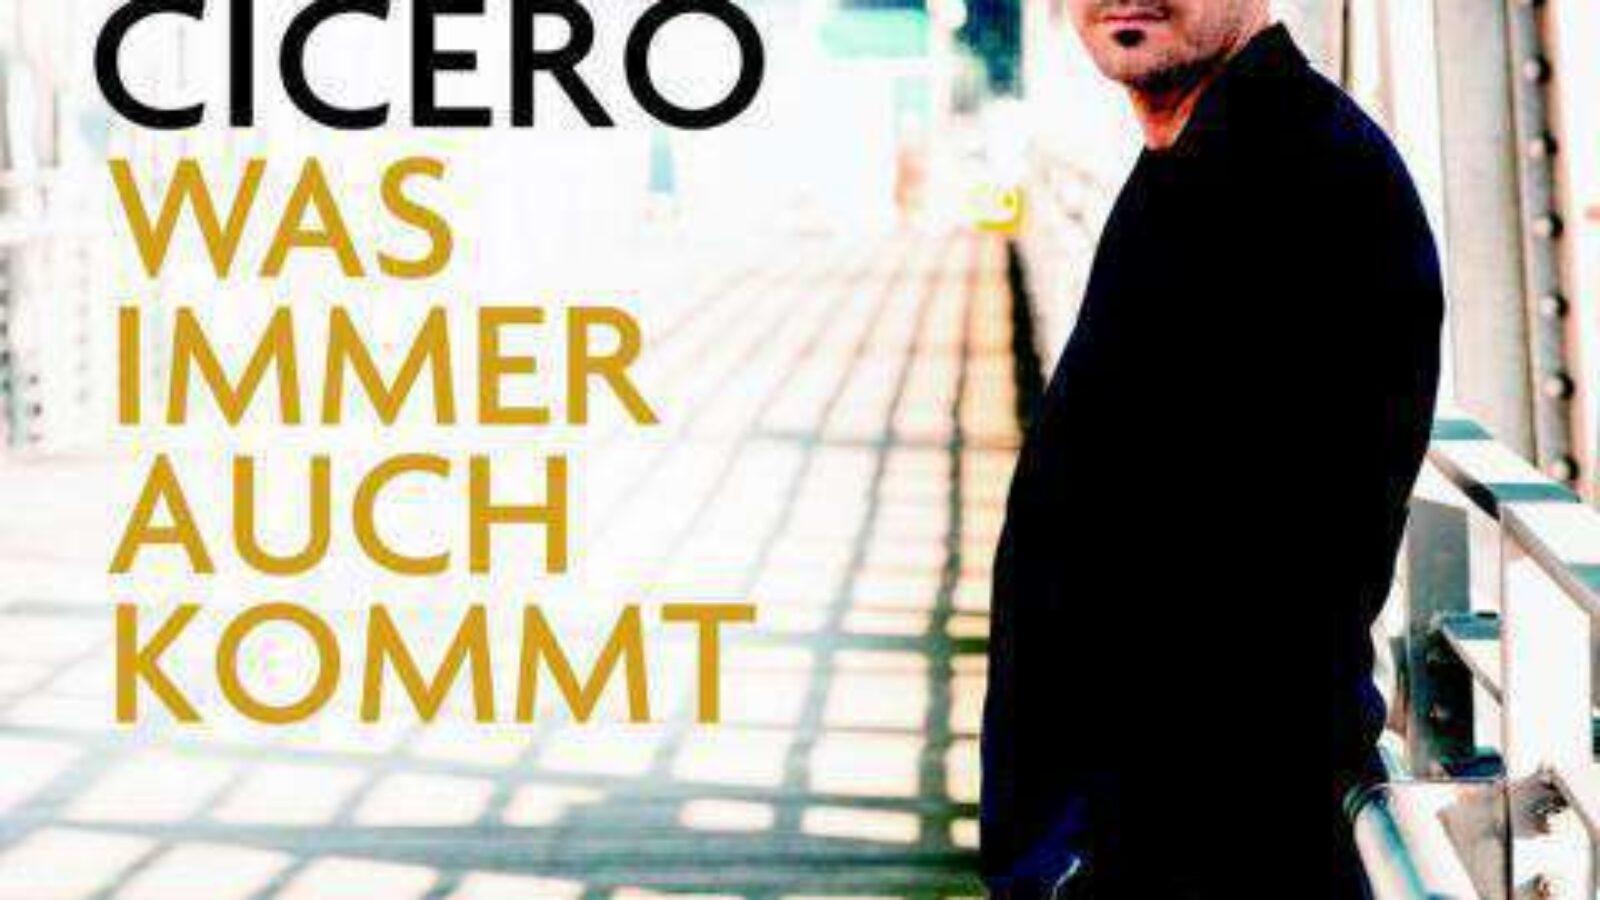 ROGER CICERO – Was Immer Auch Kommt